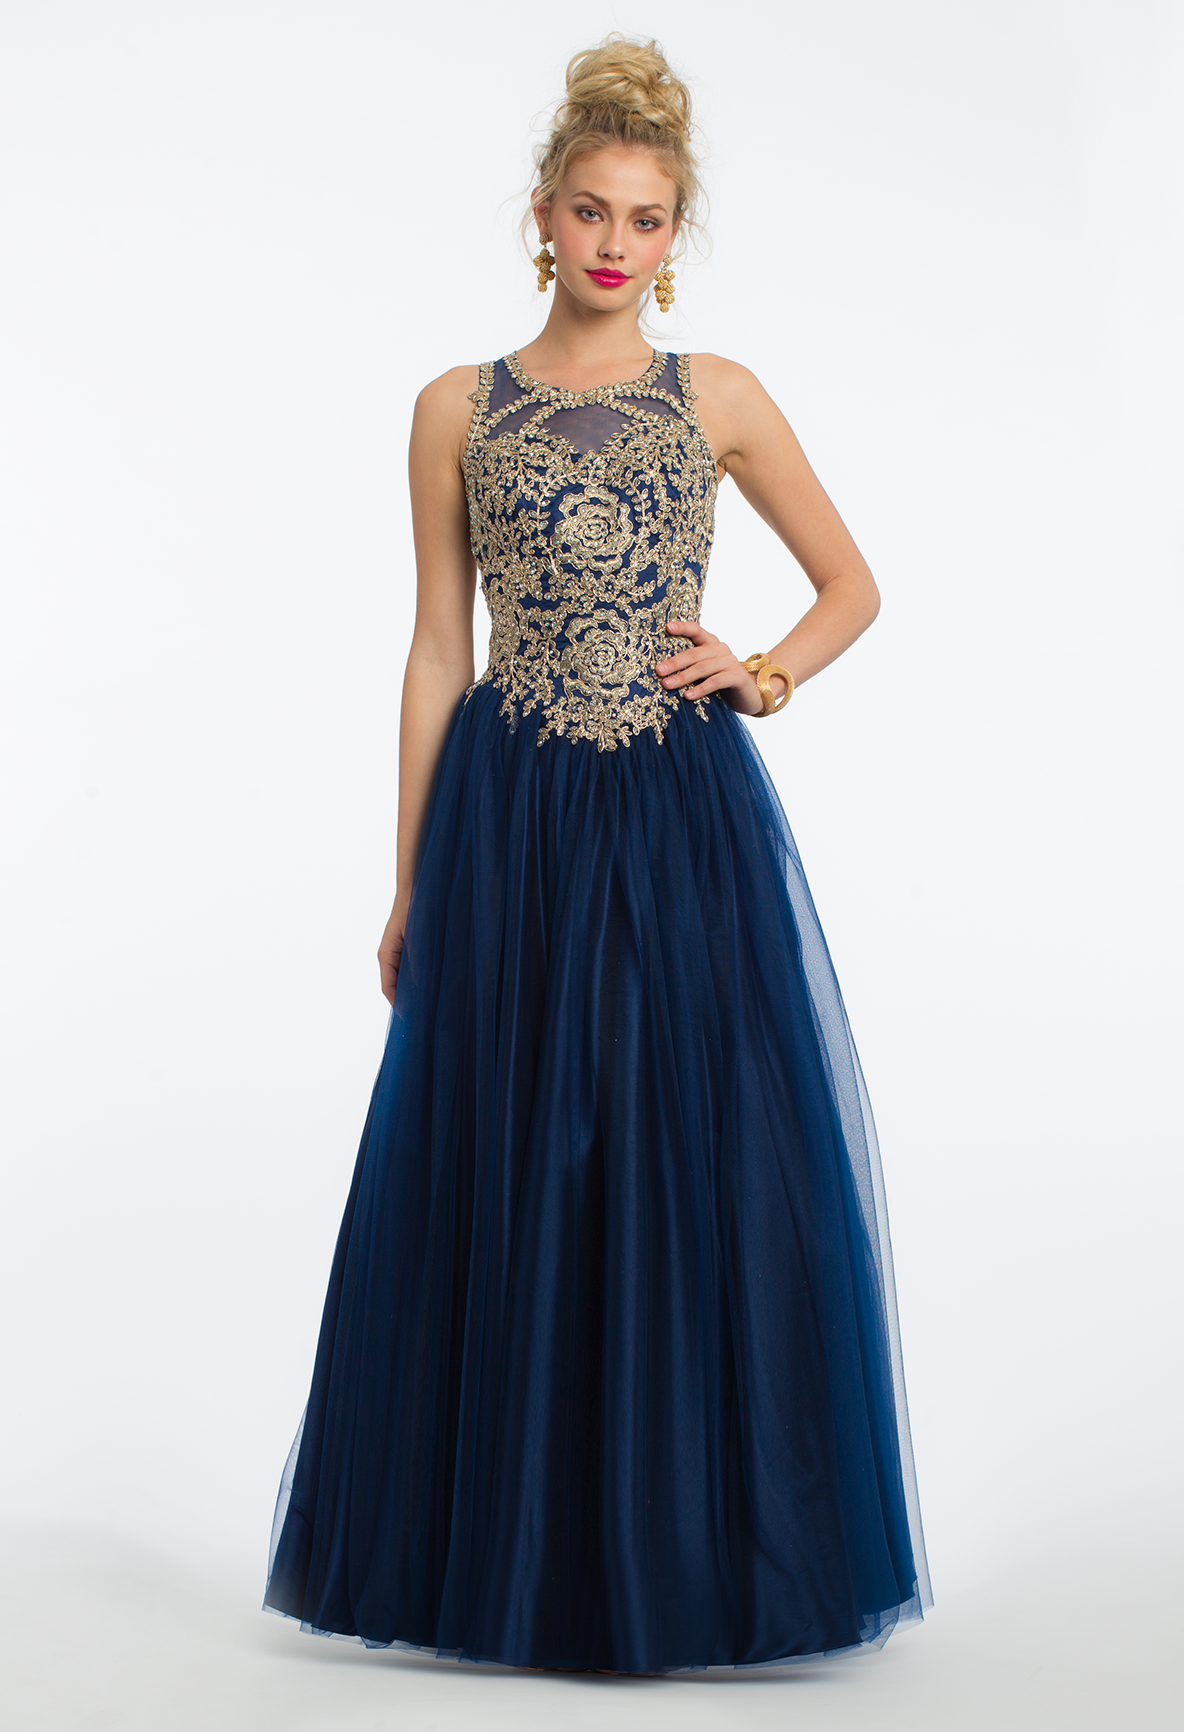 3cb260934f51 Metallic Applique Tulle Ballgown Lace Up Dress | Trend Alert: Ballgowns